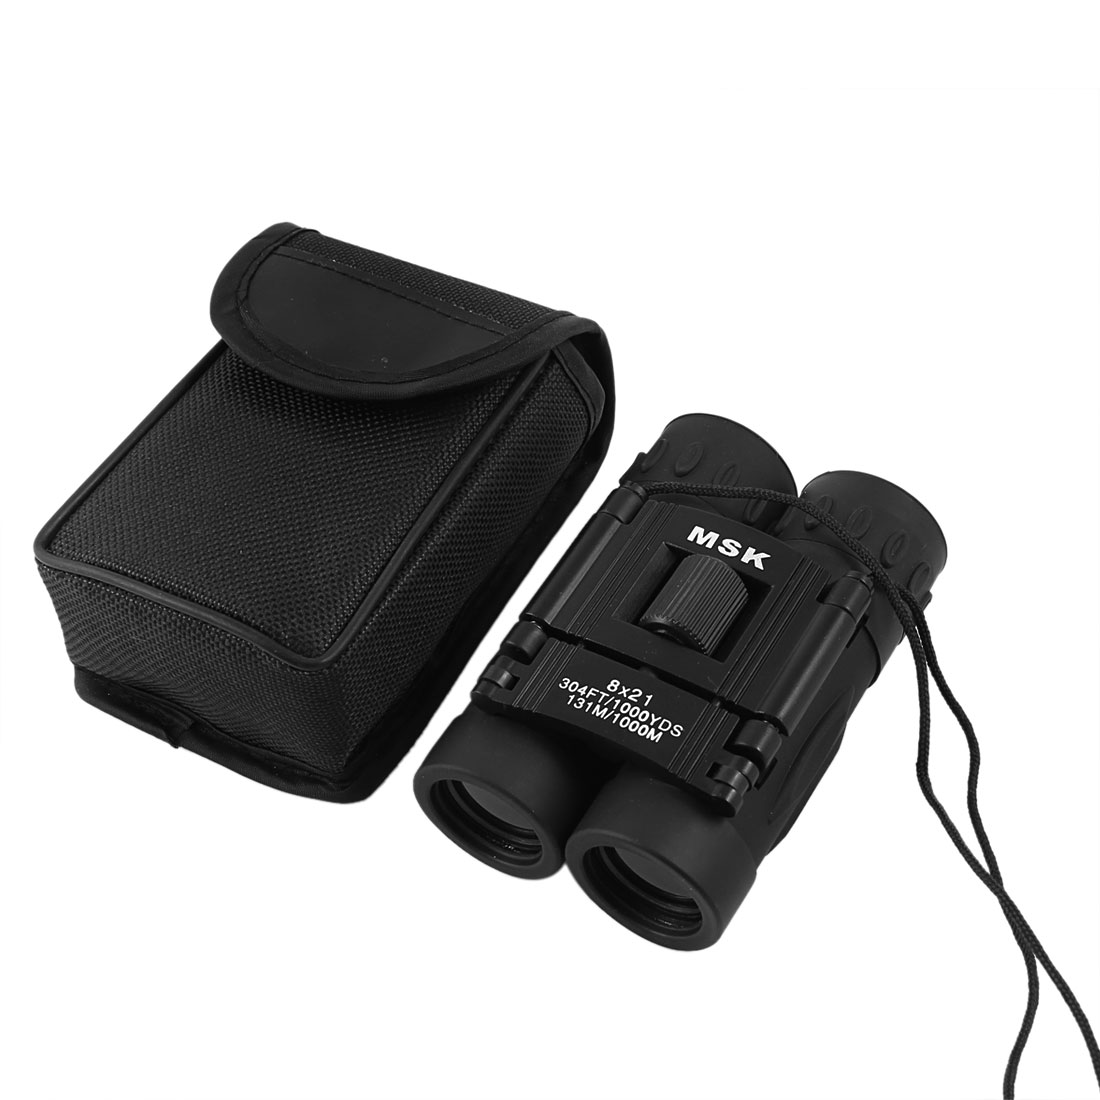 Fully Multi-coated Folding 8x21 Compact Binoculars Telescope Black